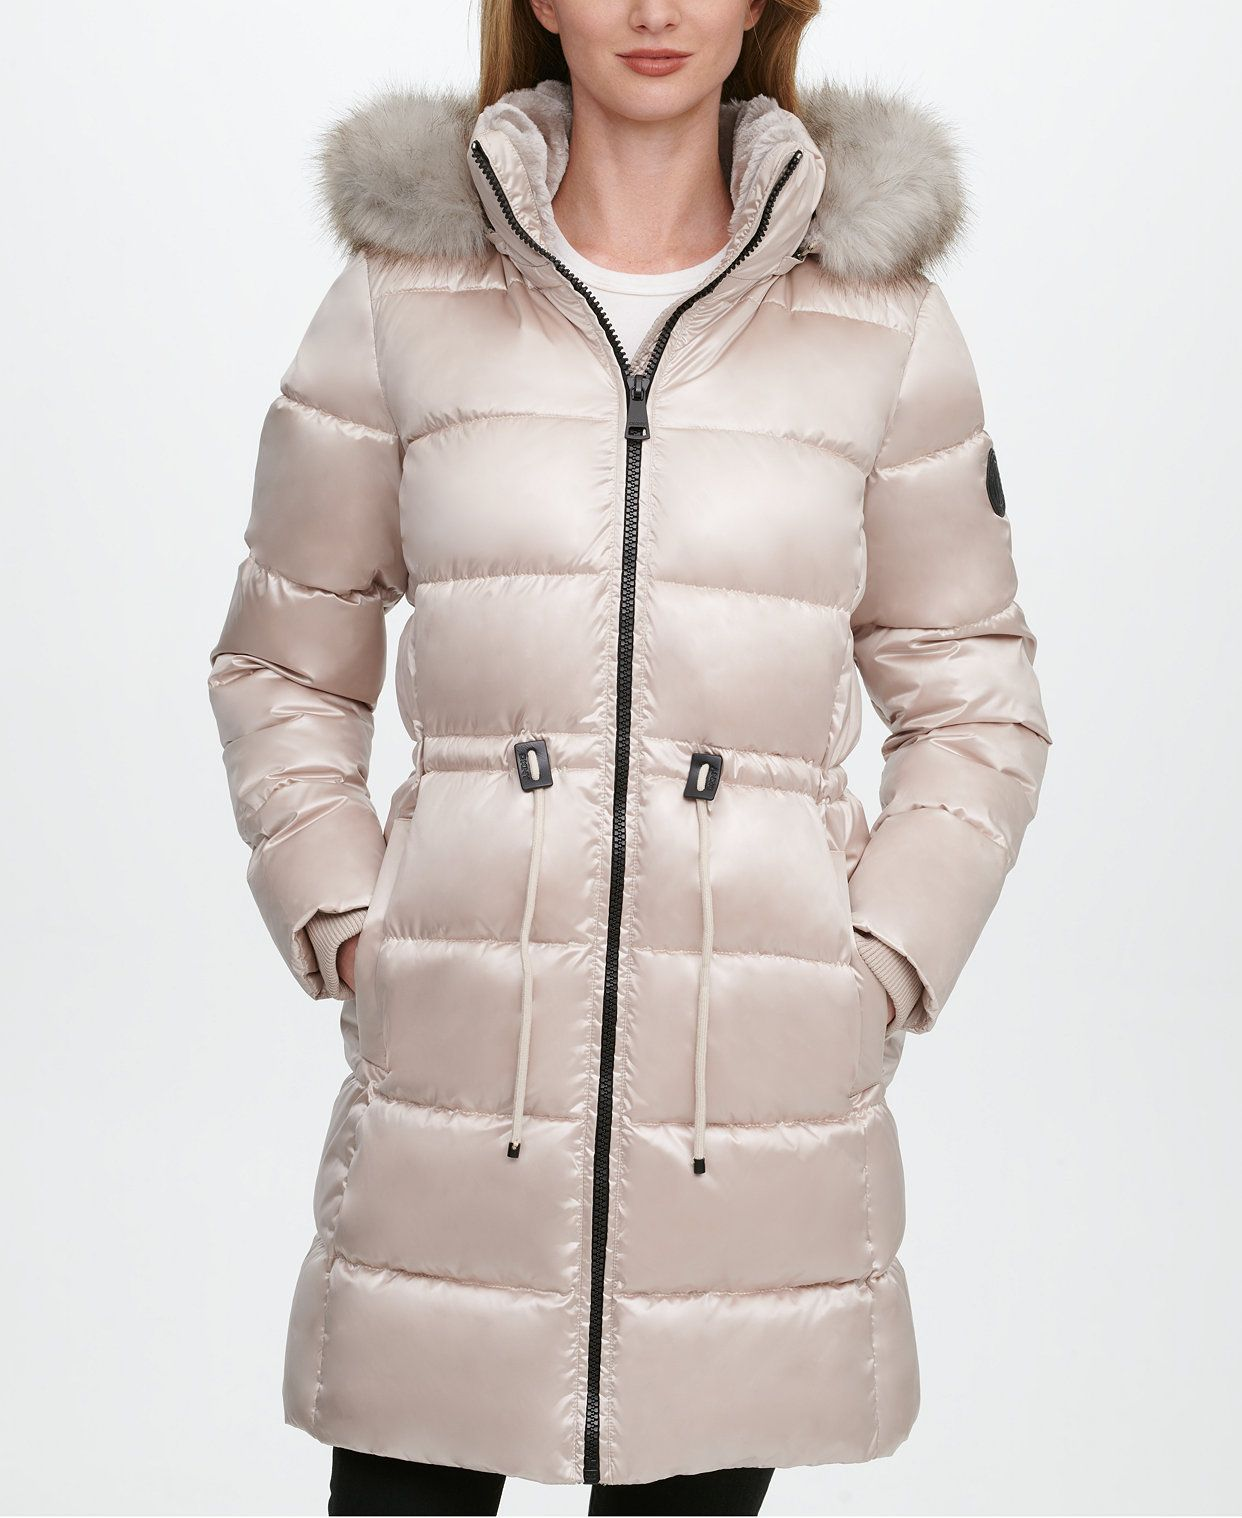 Dkny High Shine Faux Fur Trim Hooded Puffer Coat Created For Macy S Reviews Coats Women Macy S In 2021 Women S Puffer Coats Puffer Coat Fur Trim [ 1518 x 1242 Pixel ]